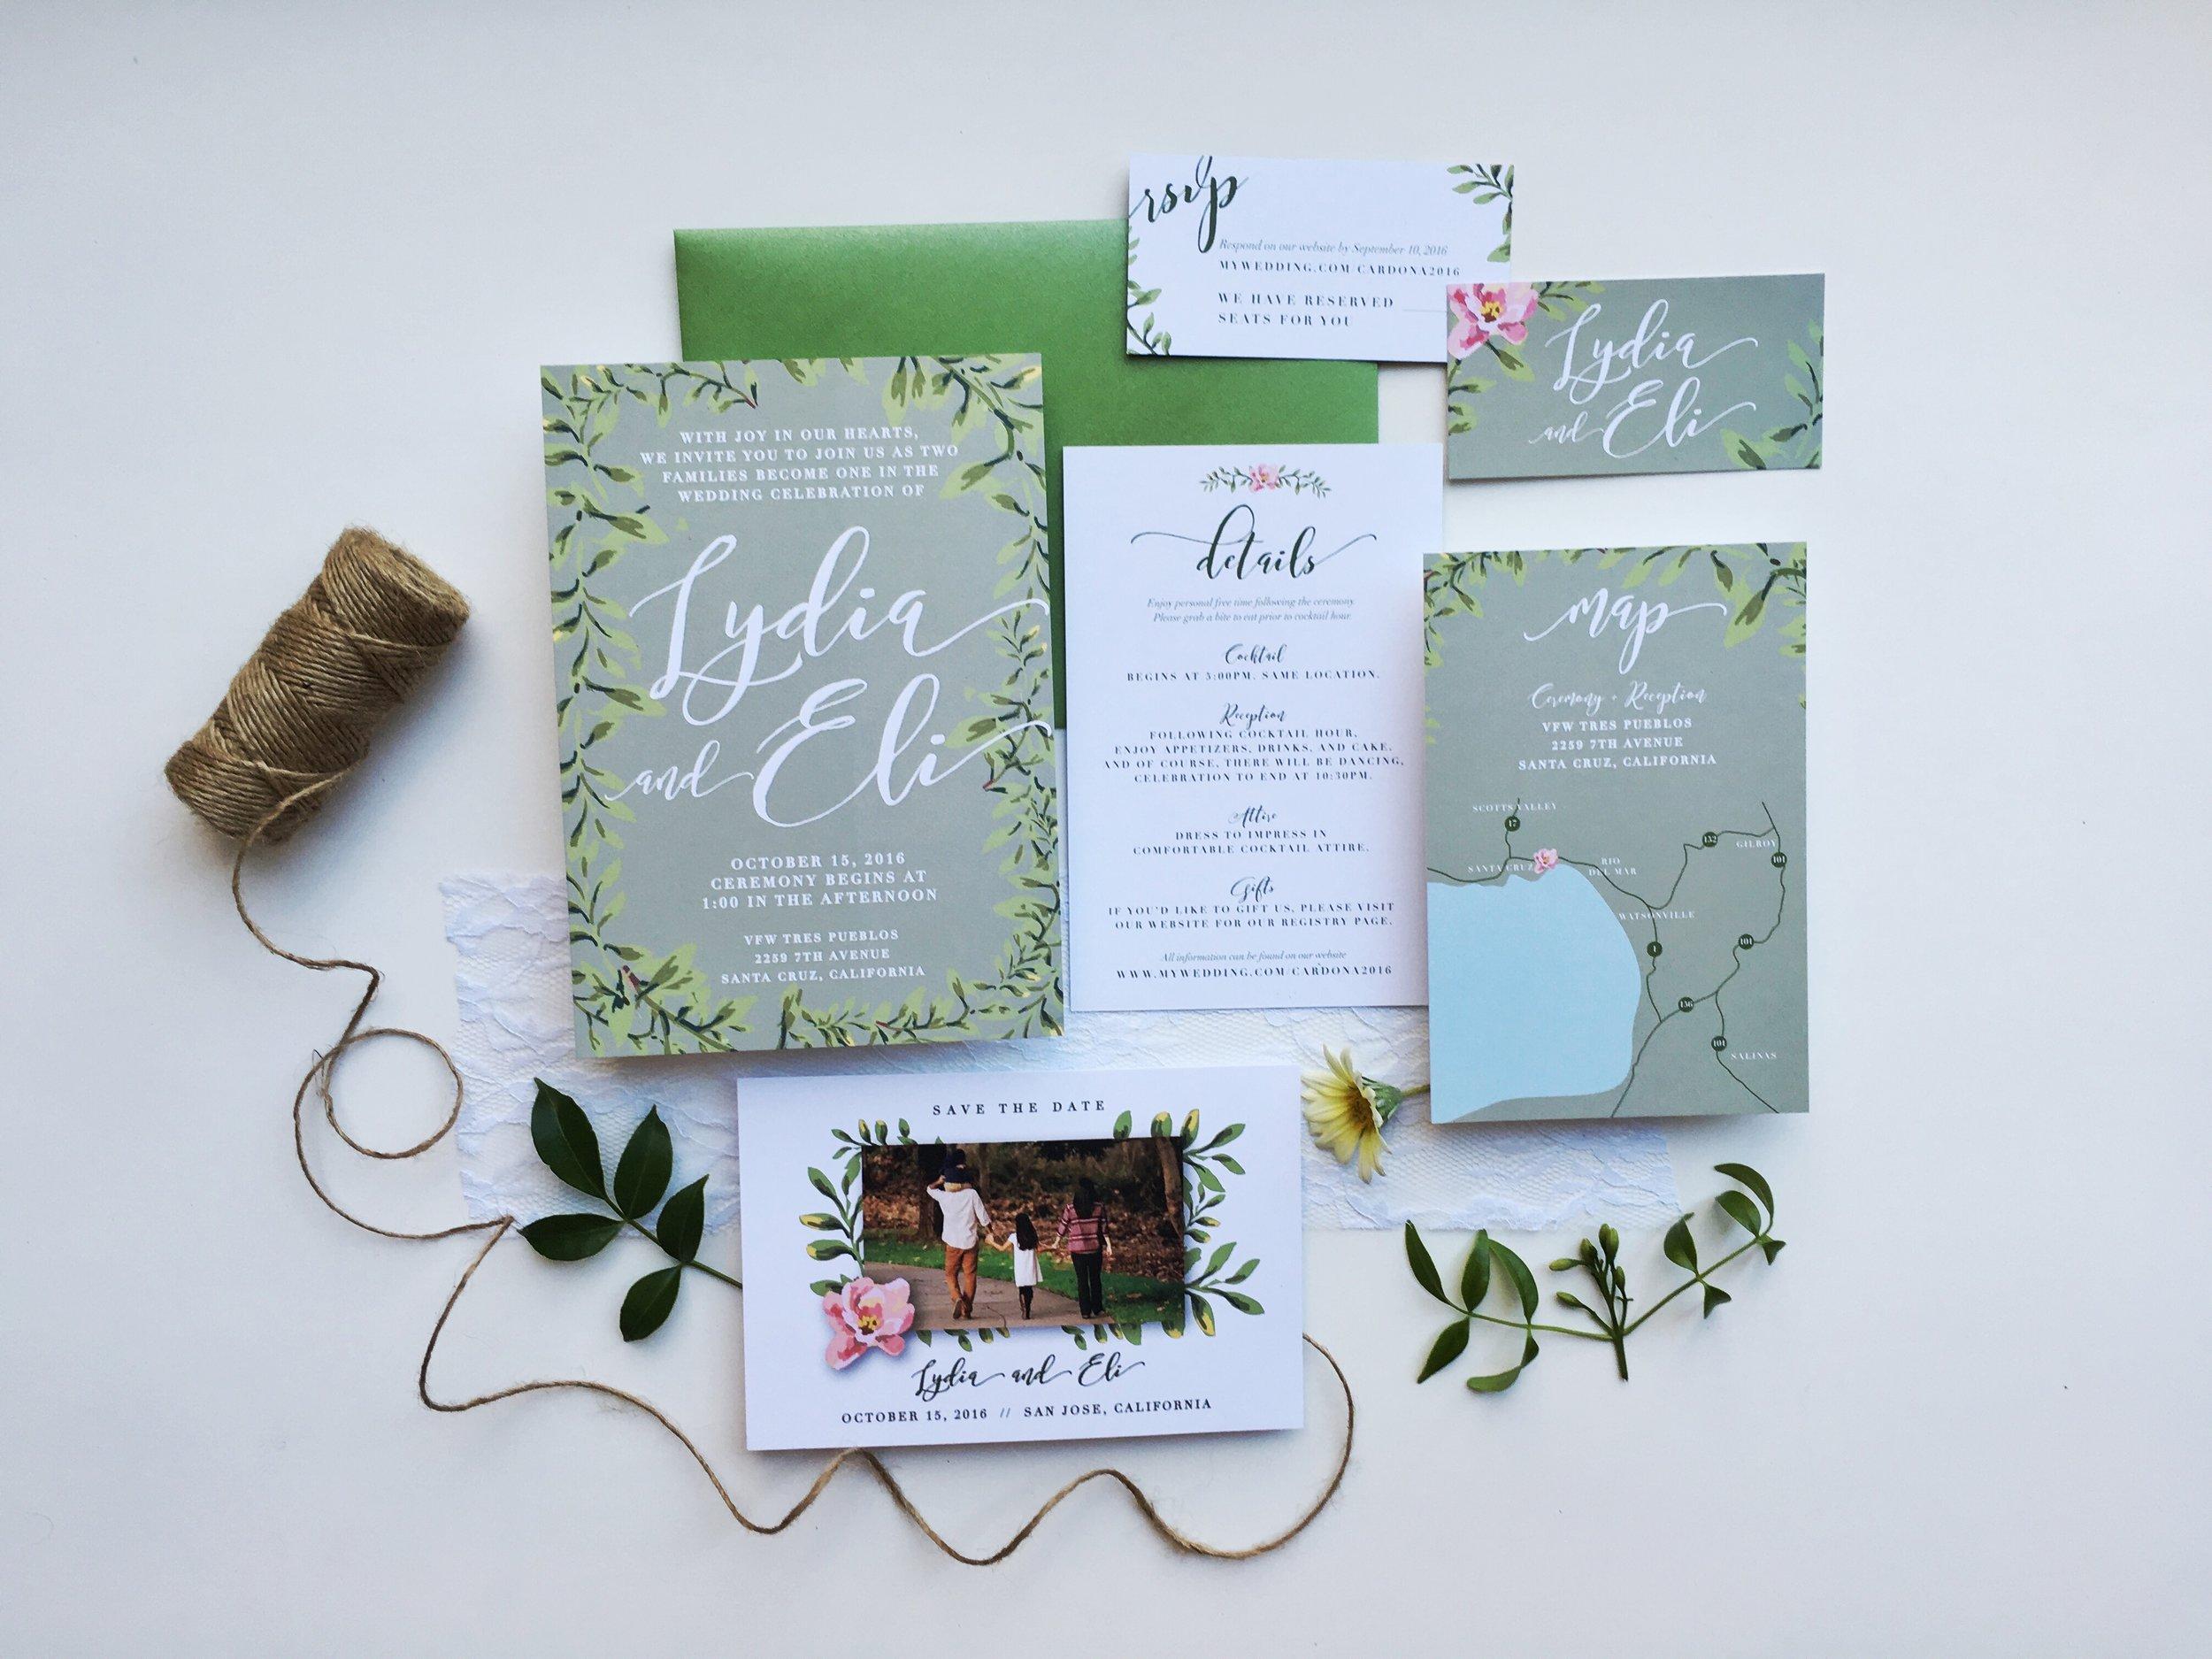 Rita-Alexis-Design-Lydia-Wedding-Invitation-Suite-Rustic-Flowers-Leaves-Muted-Colors.jpg